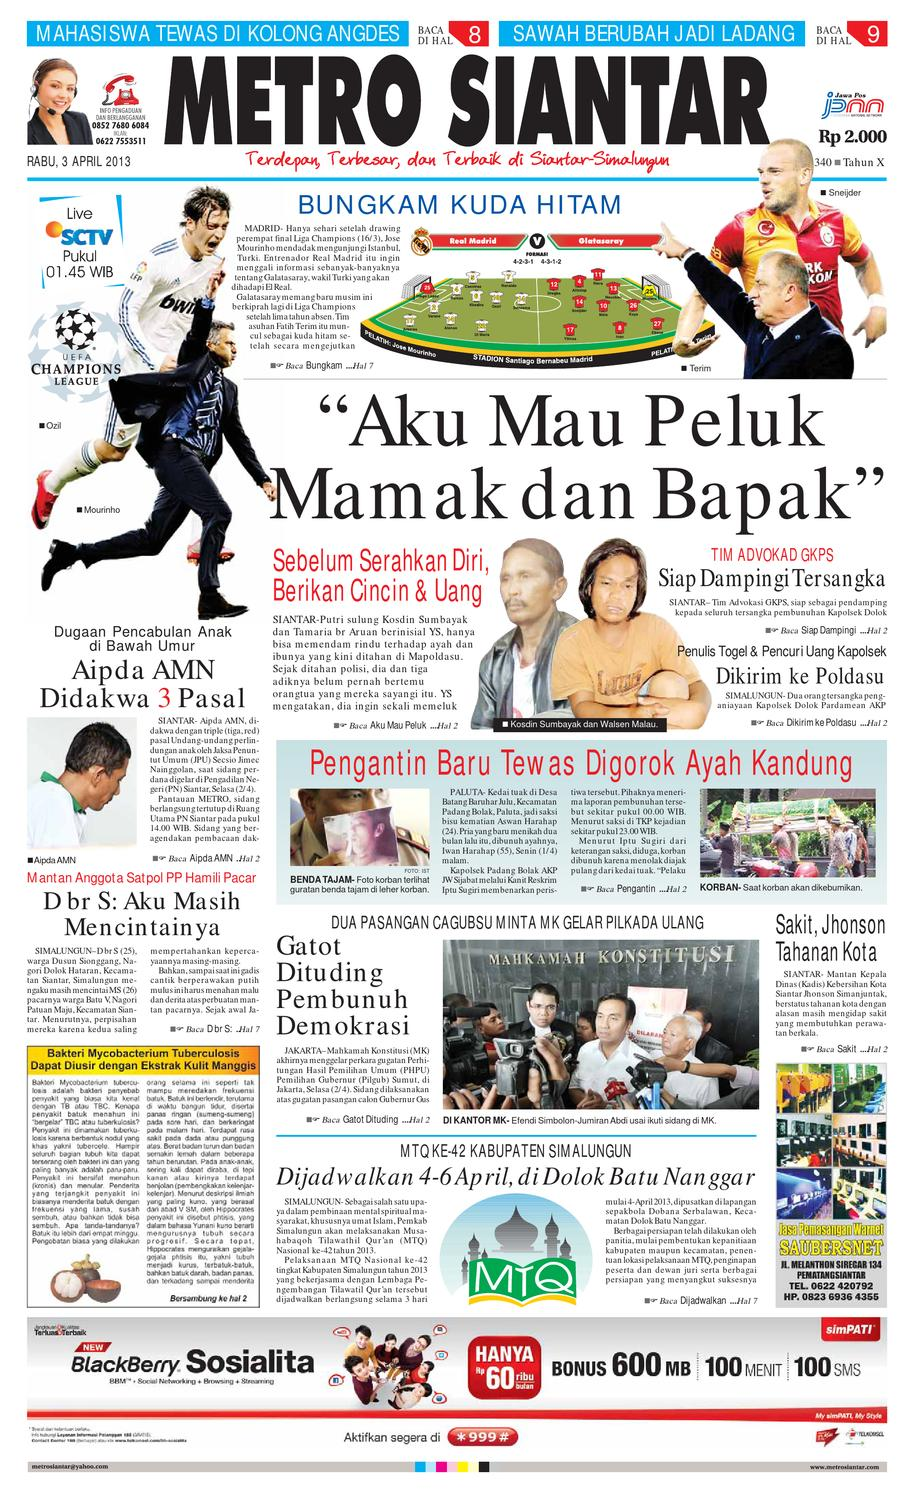 Epaper Metro Siantar Online By Issuu Produk Ukm Bumn Bakso Ikan Tuna Khas Ambon